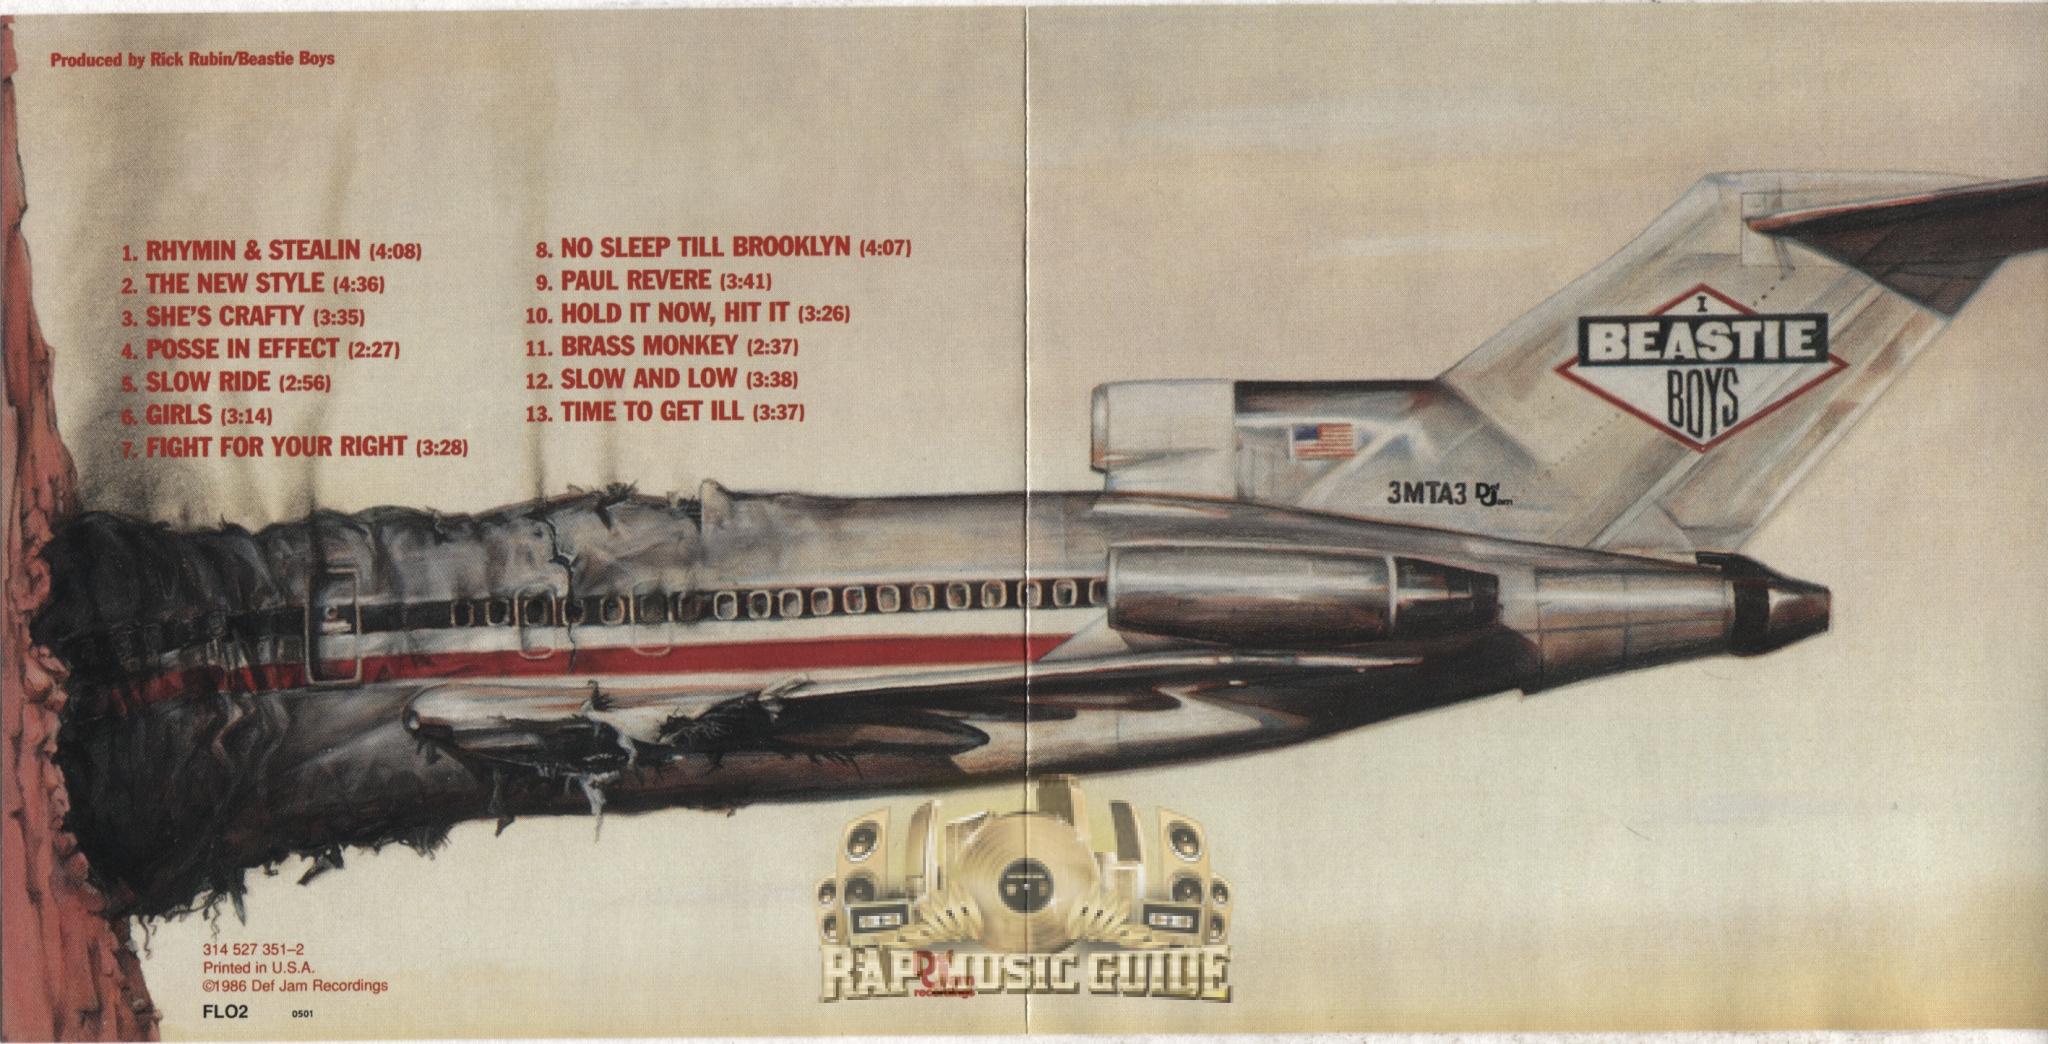 Beastie Boys Licensed To Ill Instrumentals